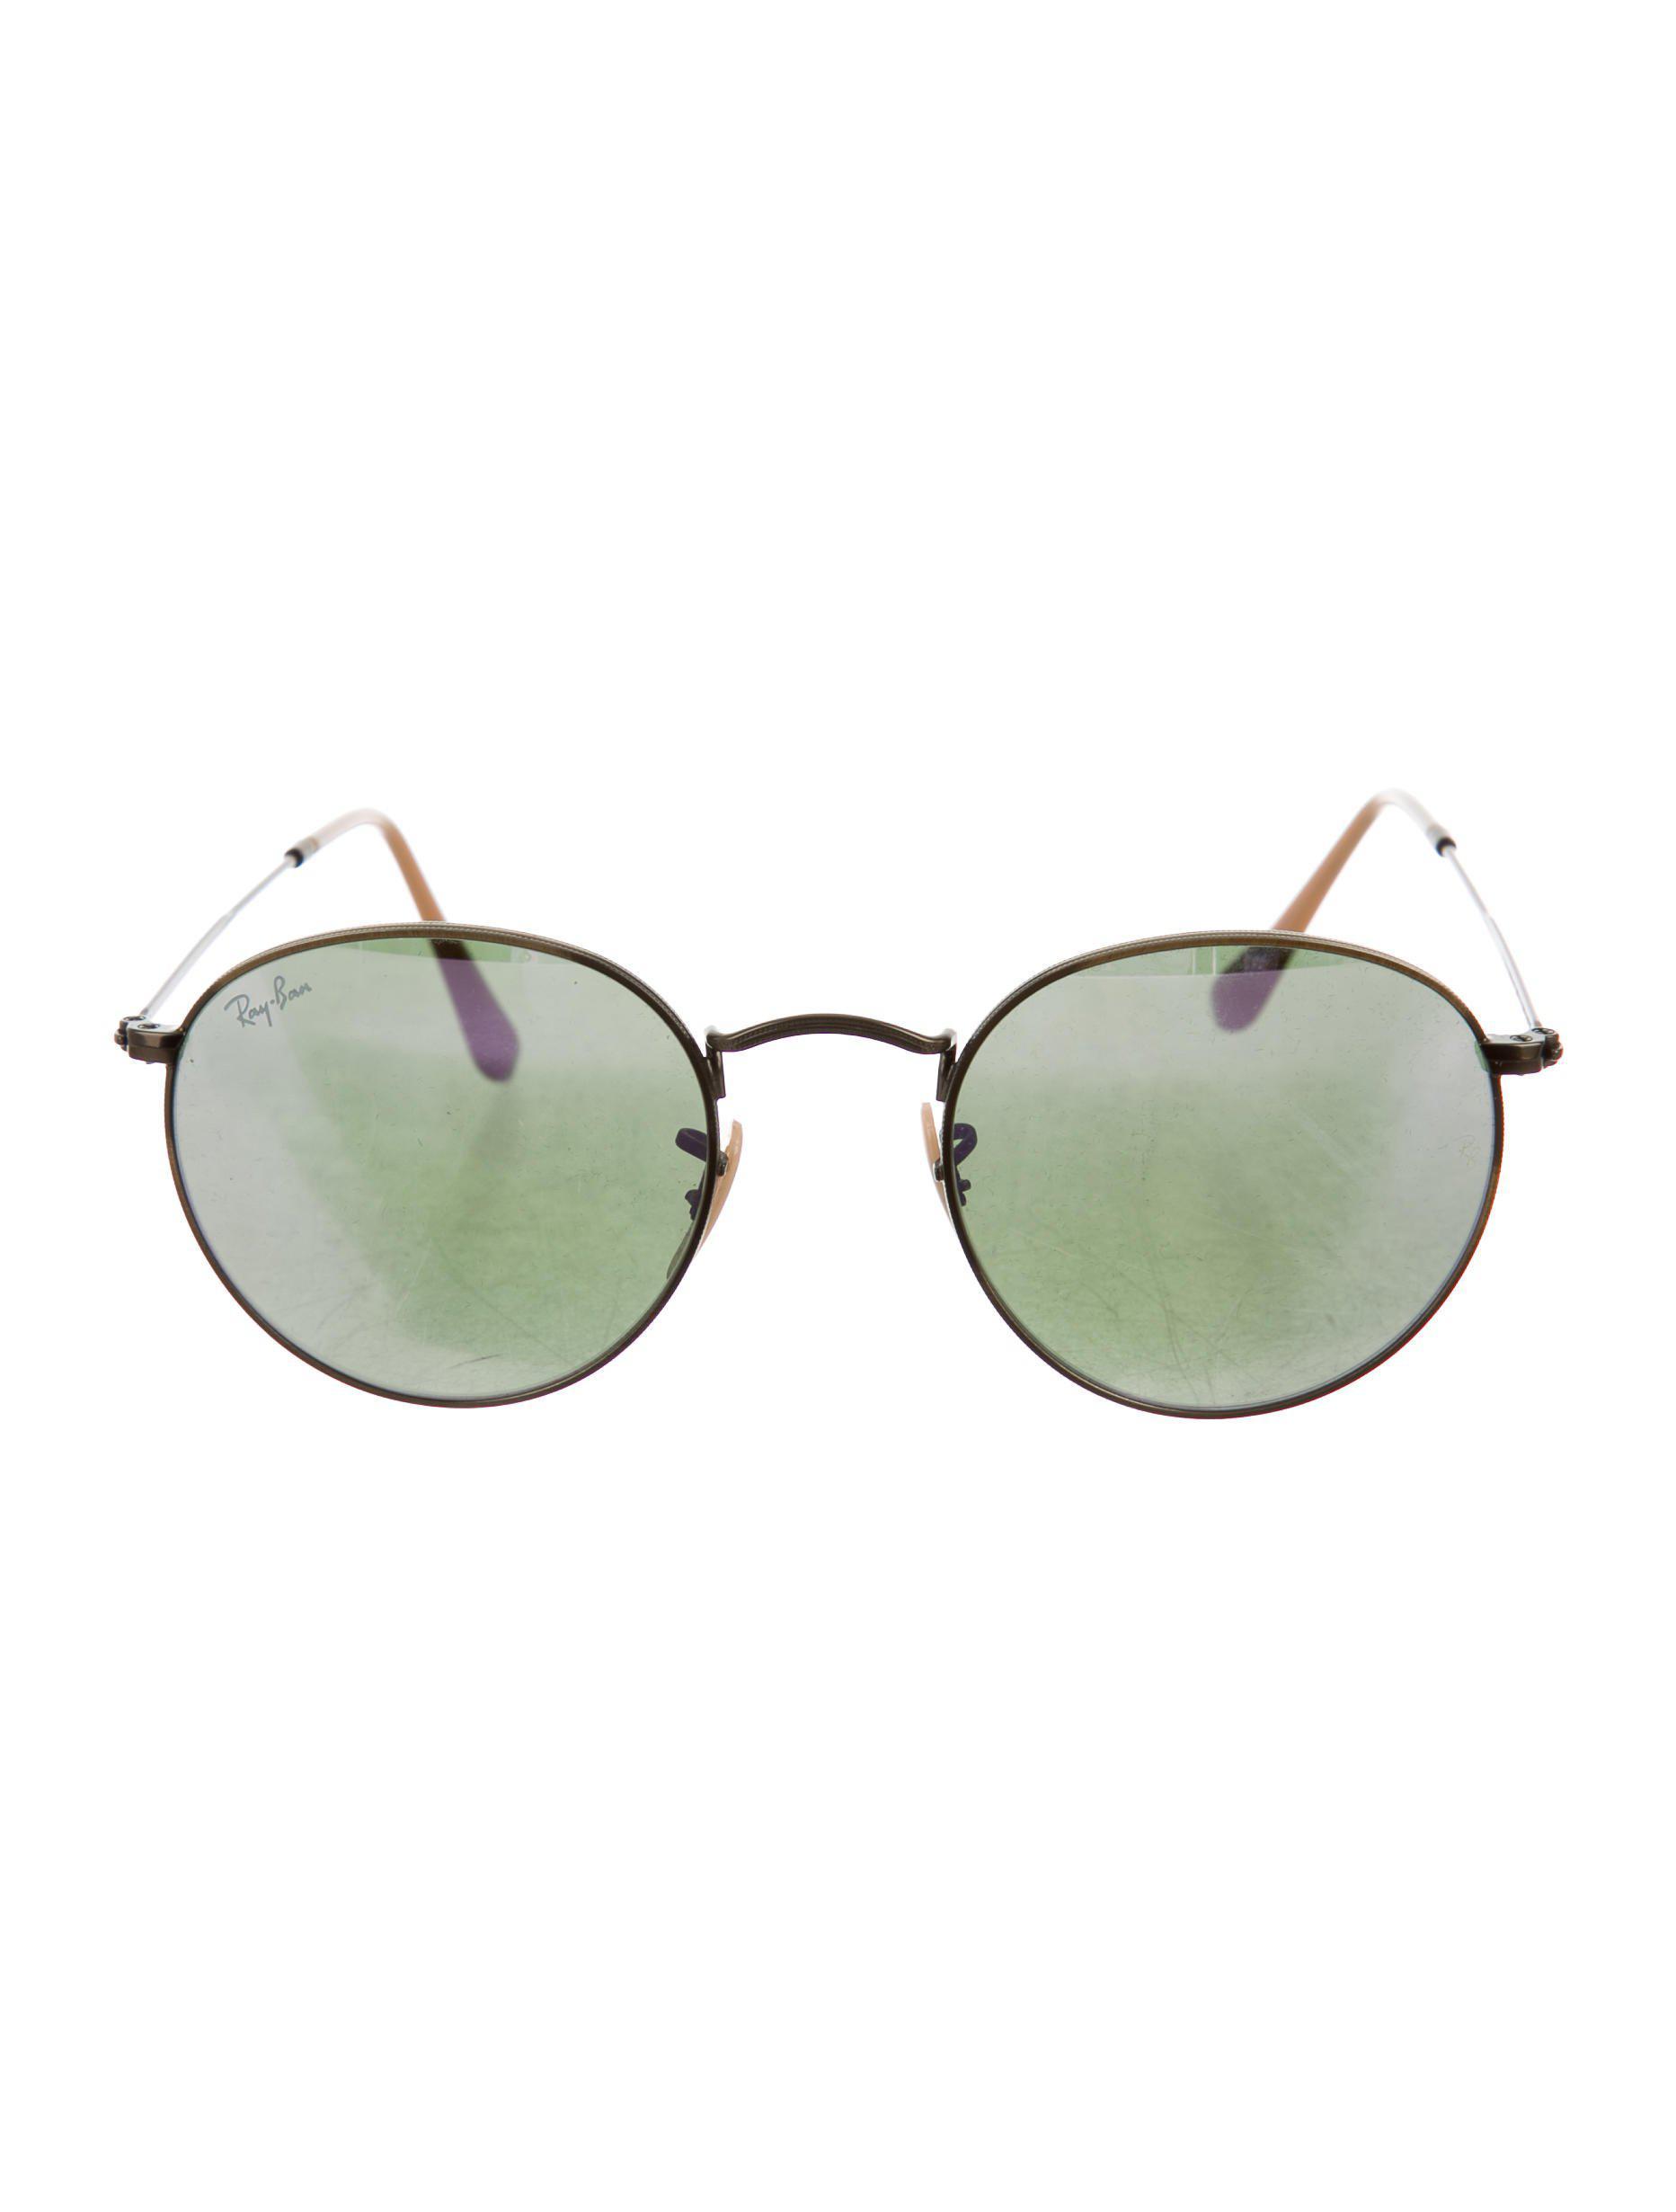 4d50eb94803d4 Lyst - Ray-Ban Round Mirrored Sunglasses Bronze in Metallic